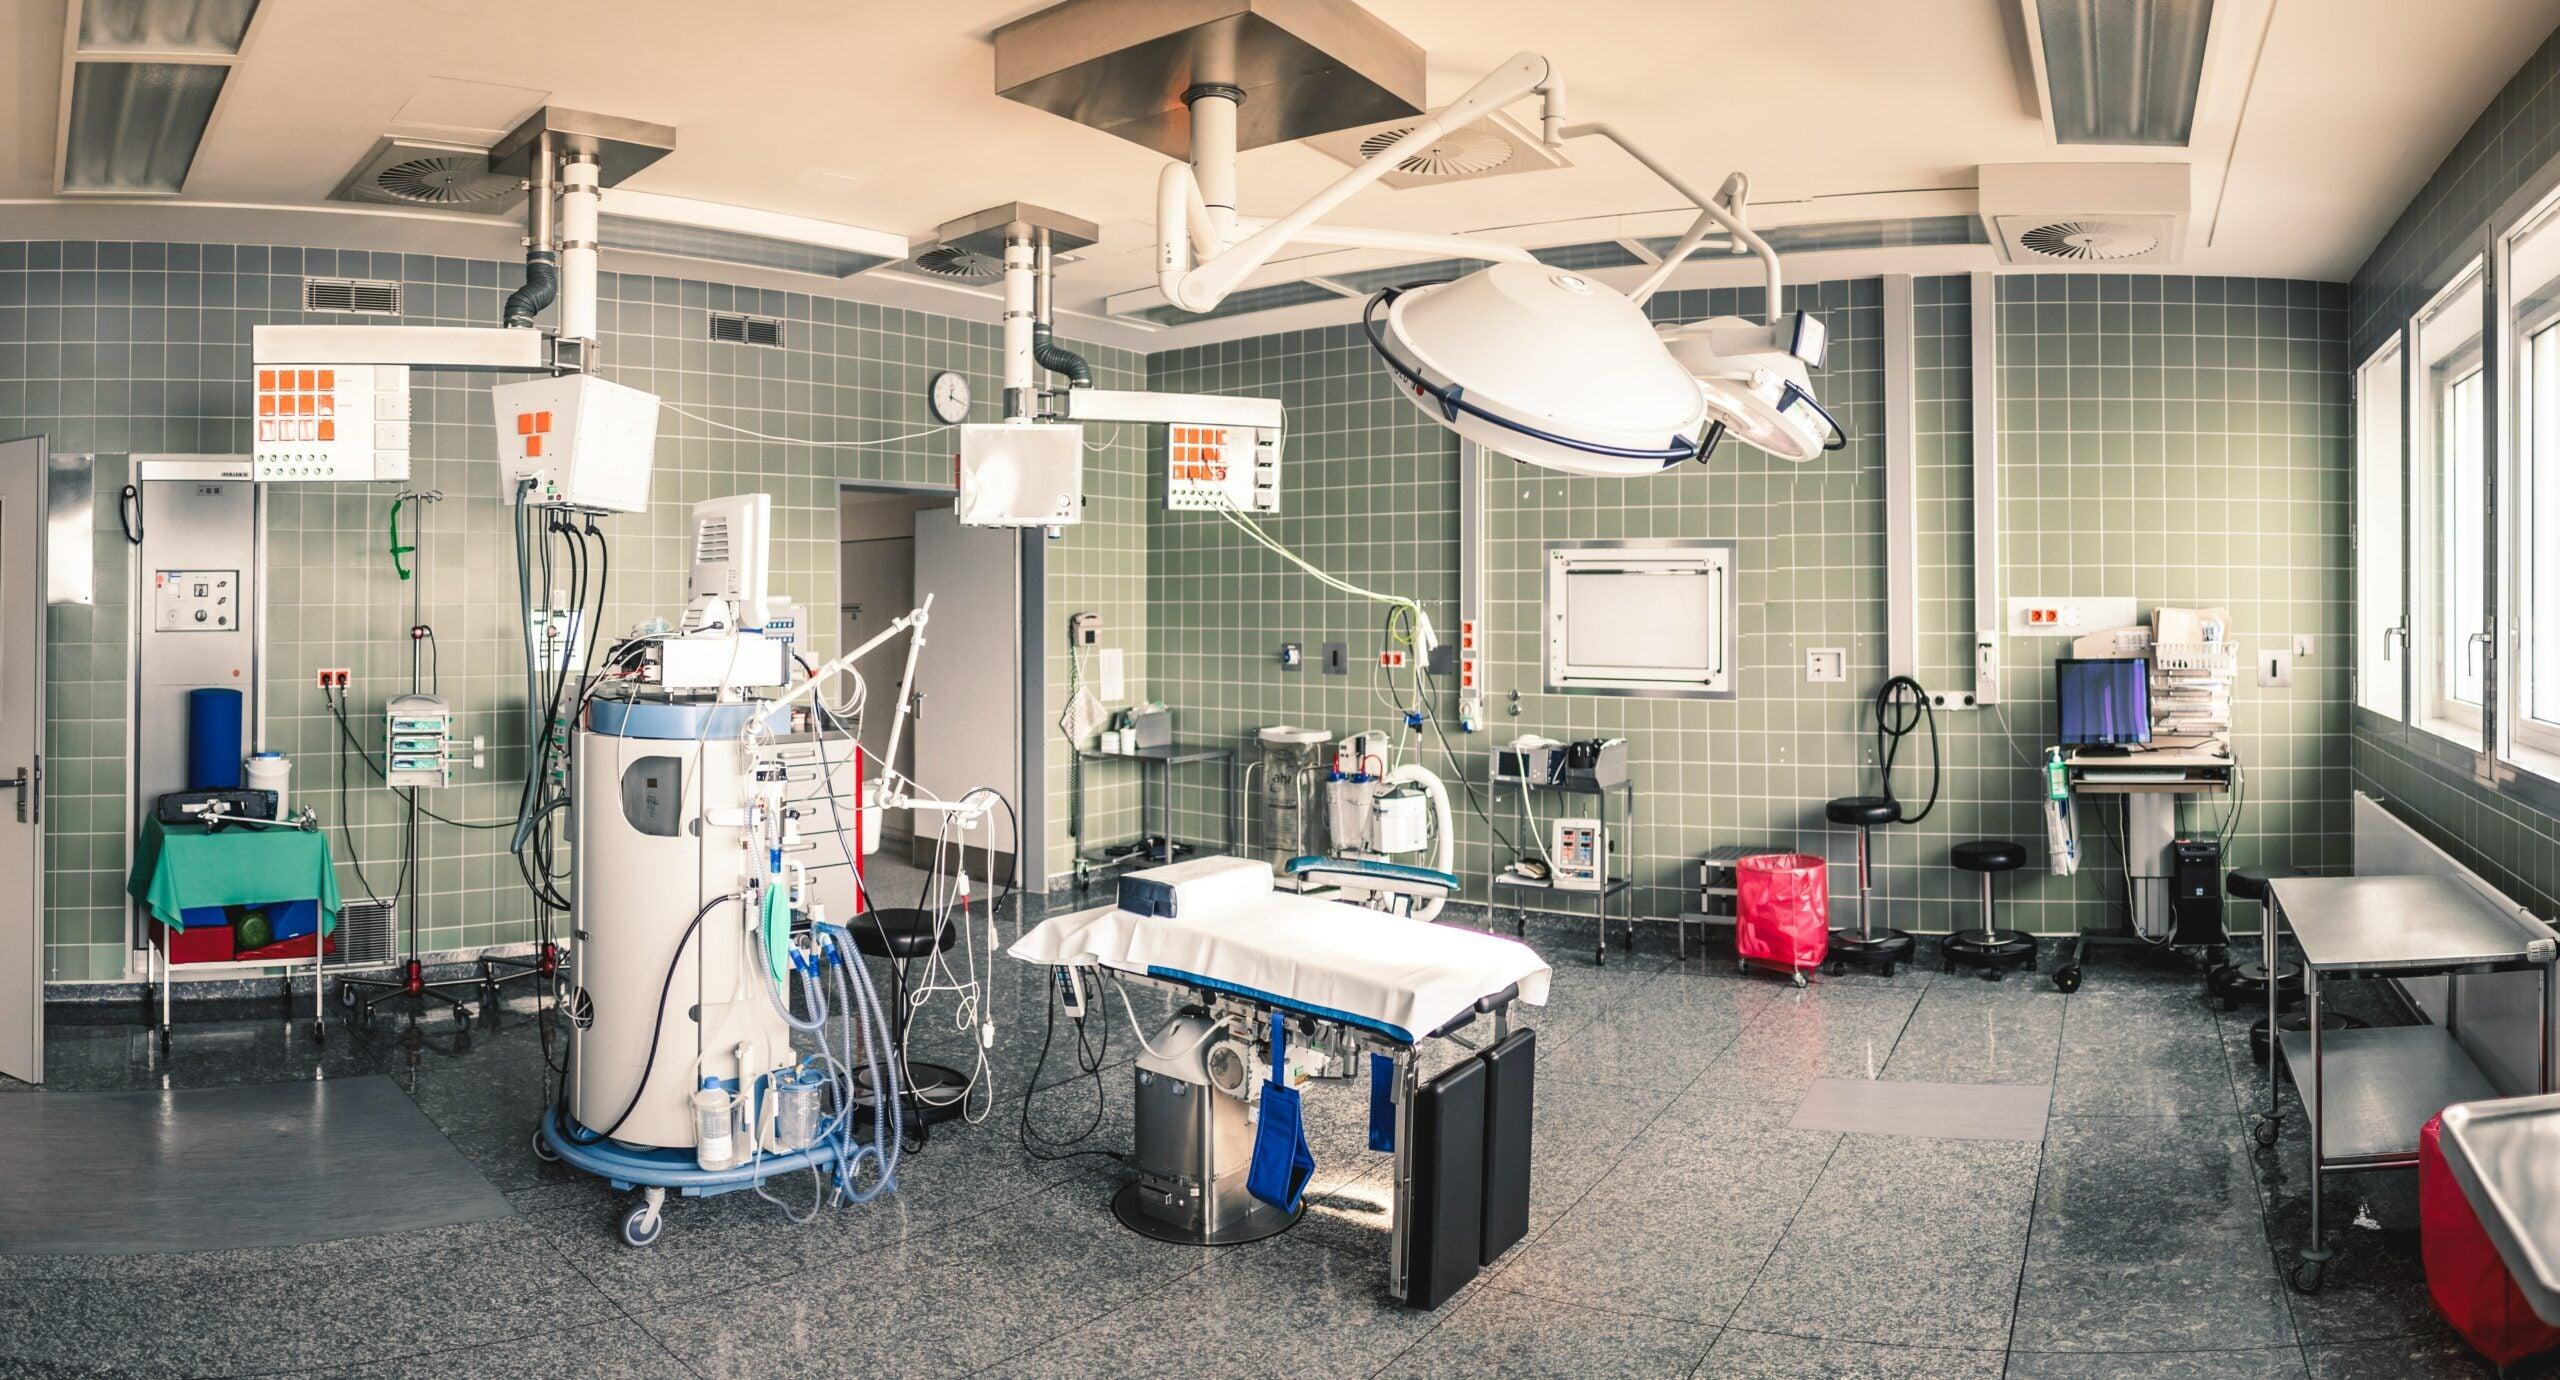 A hospital operating room